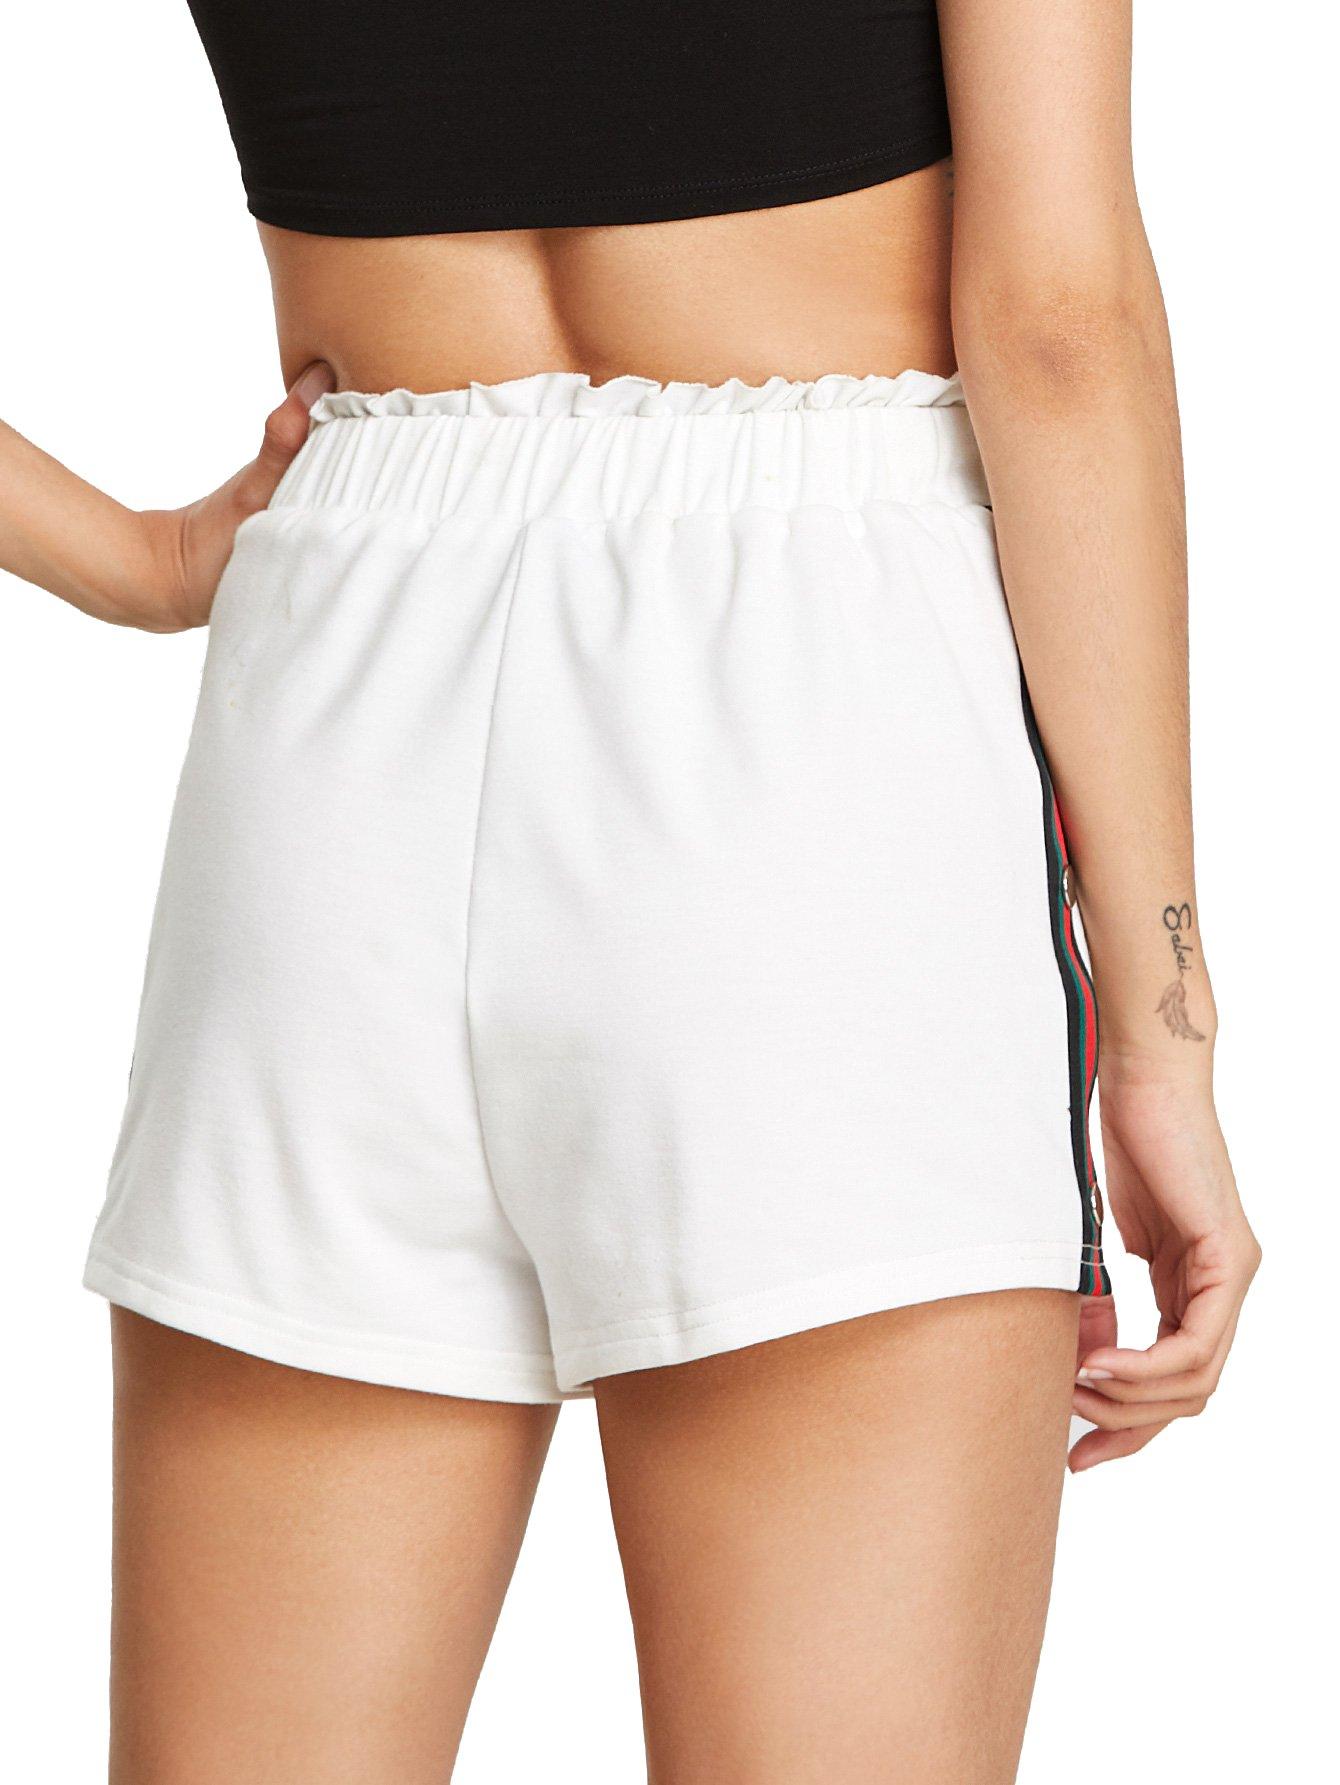 SweatyRocks Women Summer Casual Sports Workout Shorts Drawstring Elastic Waiste Hot Shorts White S by SweatyRocks (Image #4)